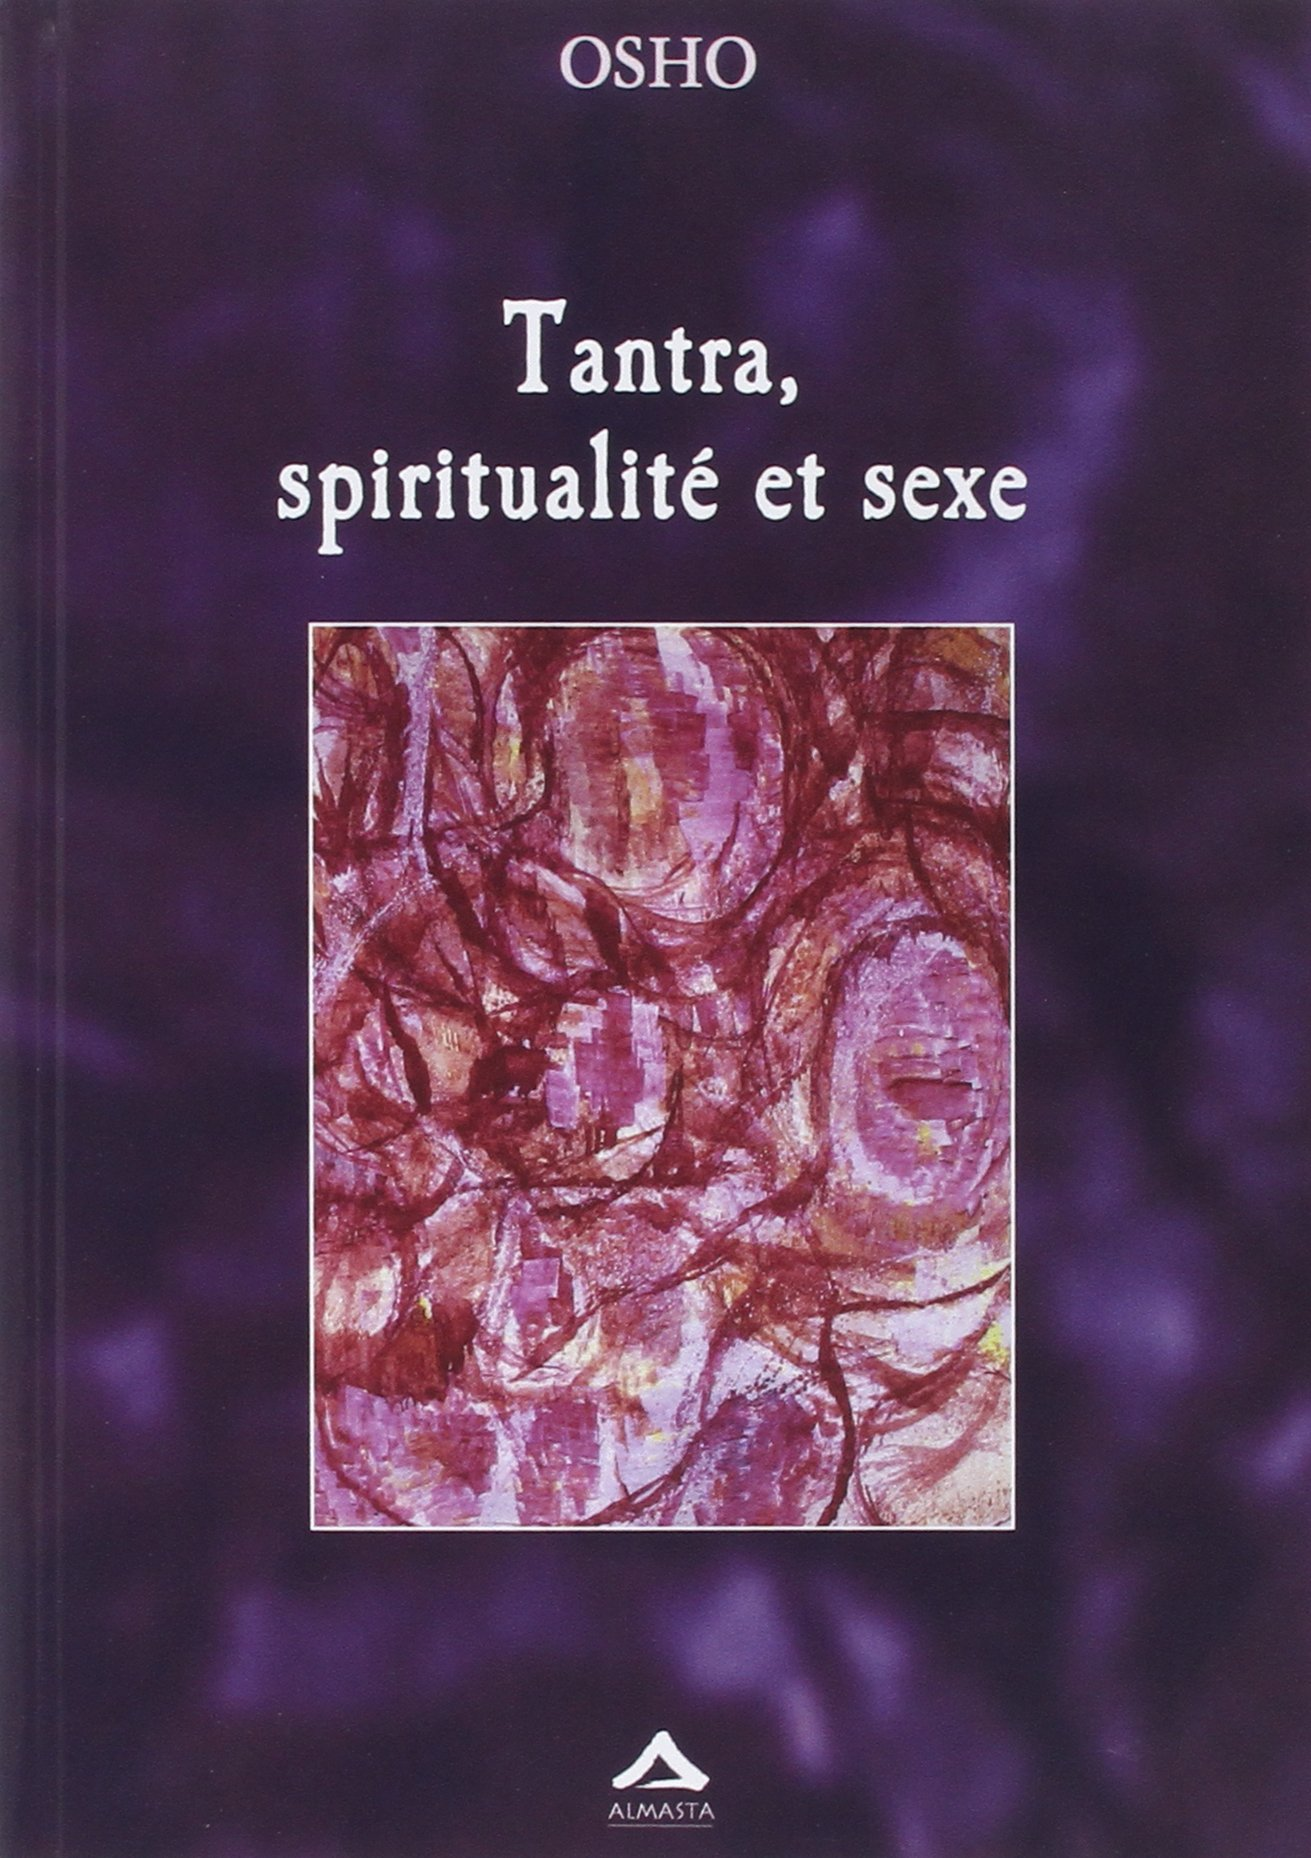 Tantra, spiritualité et sexe Broché – 28 avril 2003 Osho Sumitra Almasta Editions 2940095051